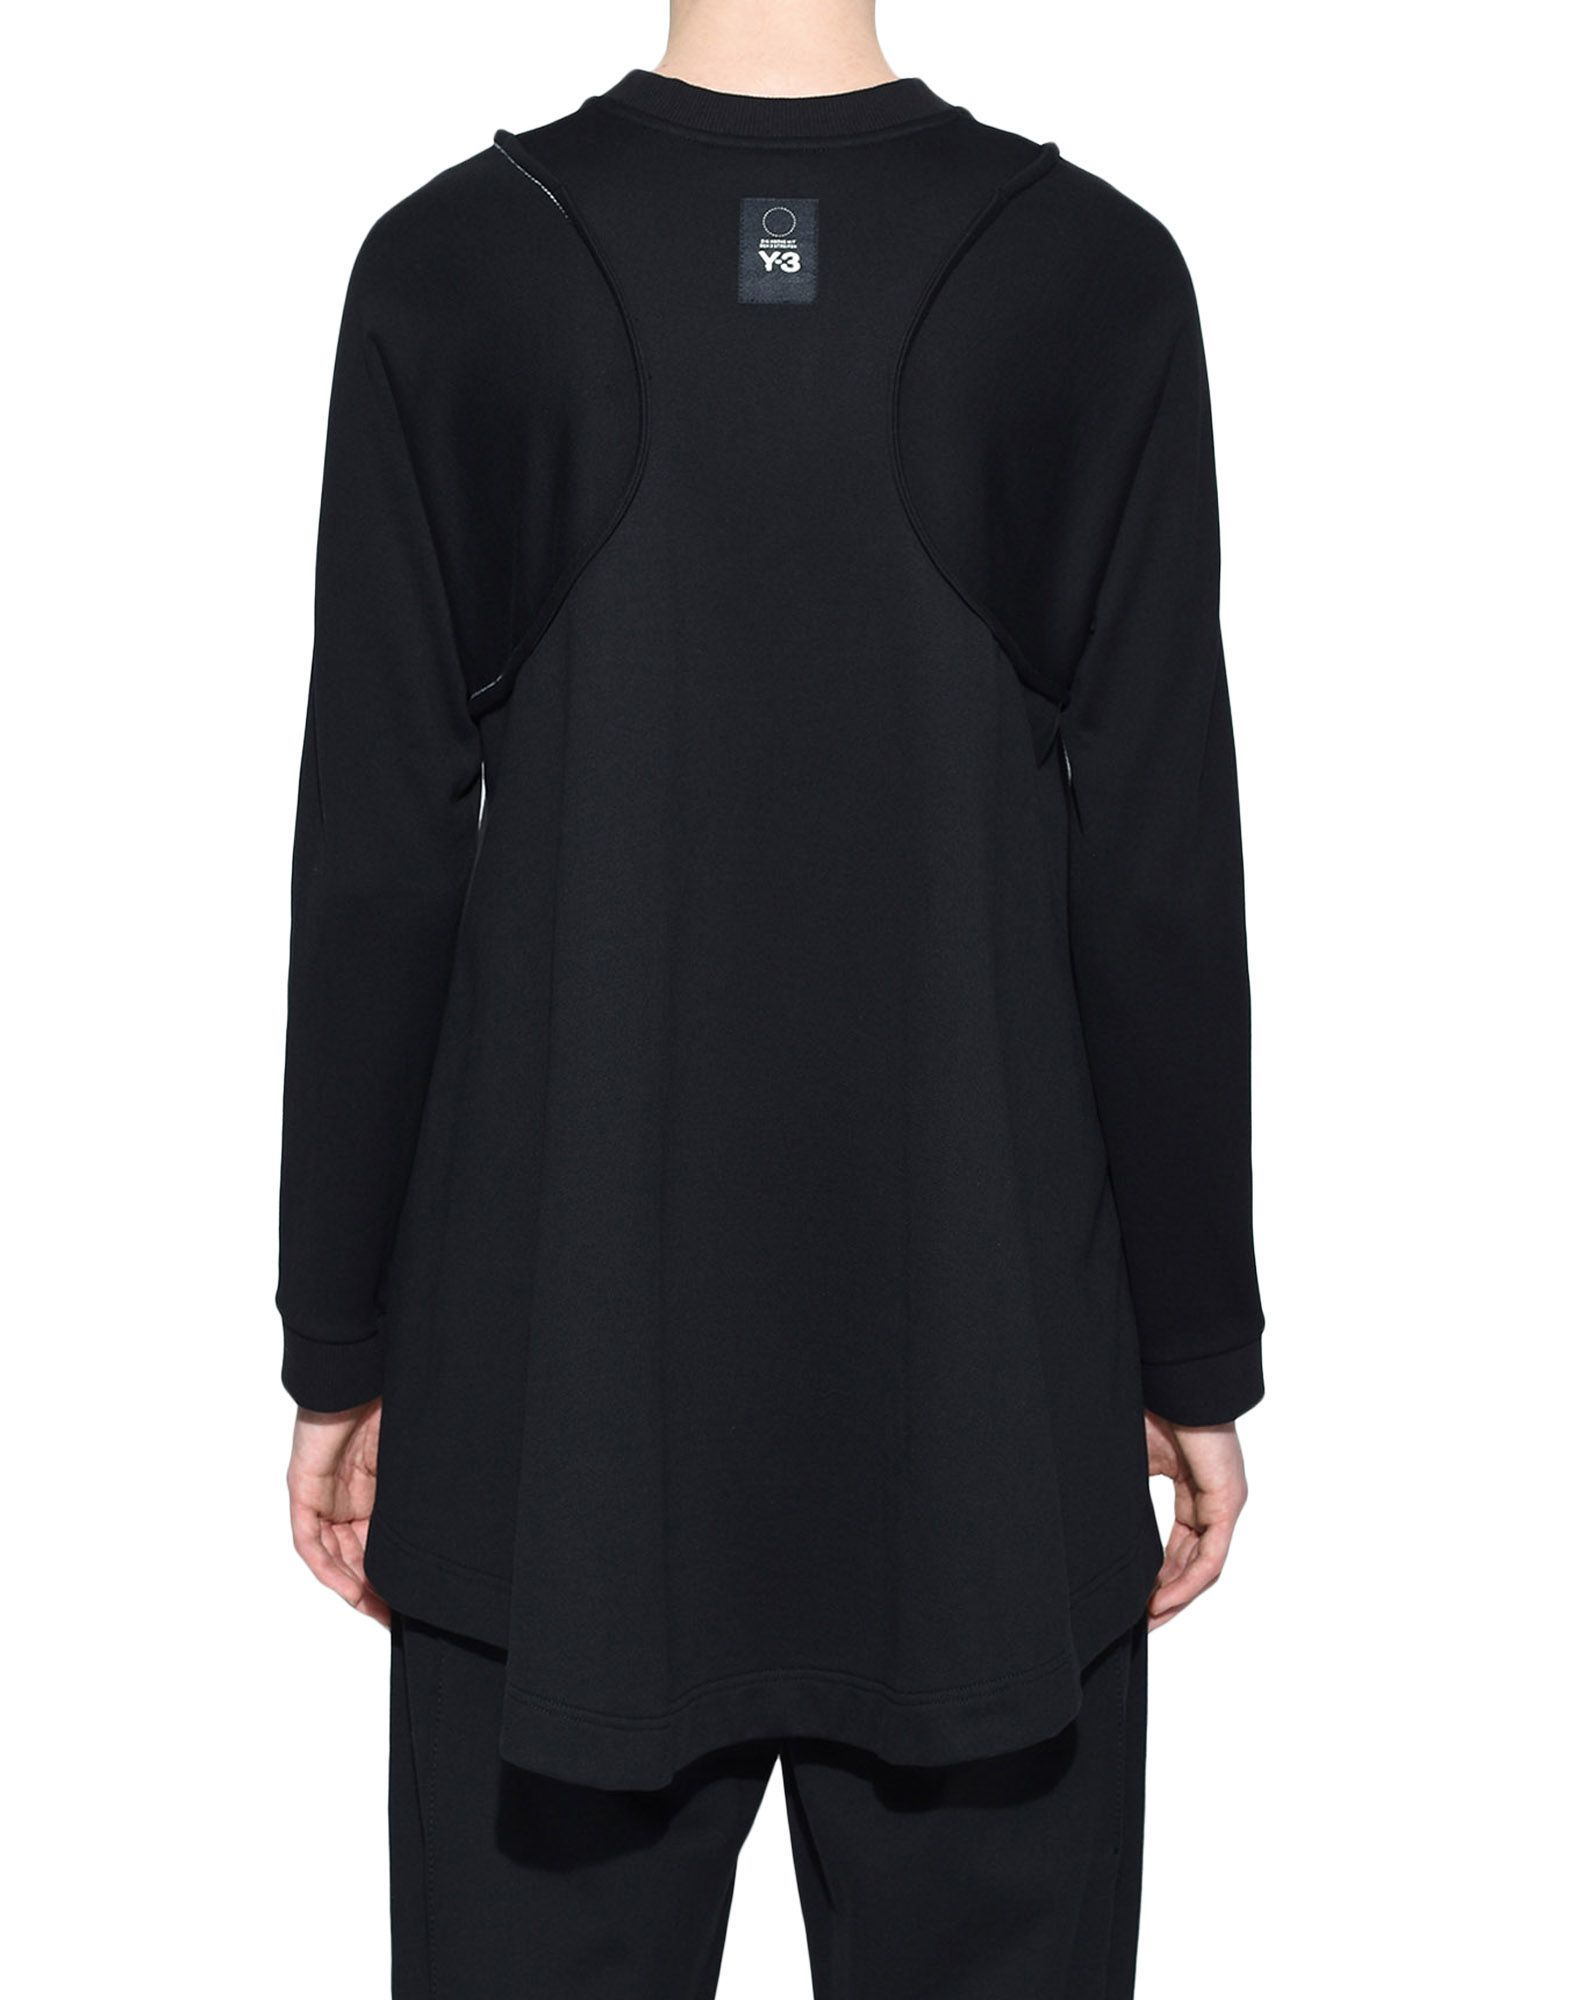 Y-3 Y-3 Sashiko Sweater Sweatshirt Woman d